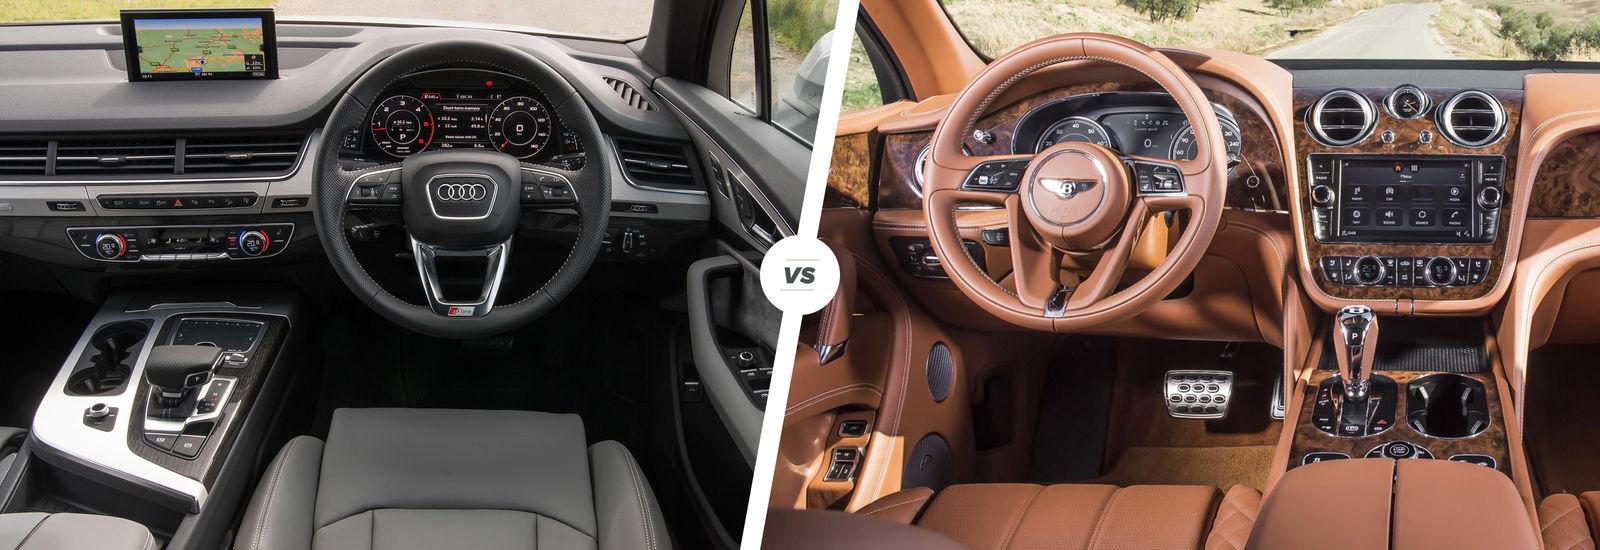 Bentley Bentayga vs Audi Q7 | carwow